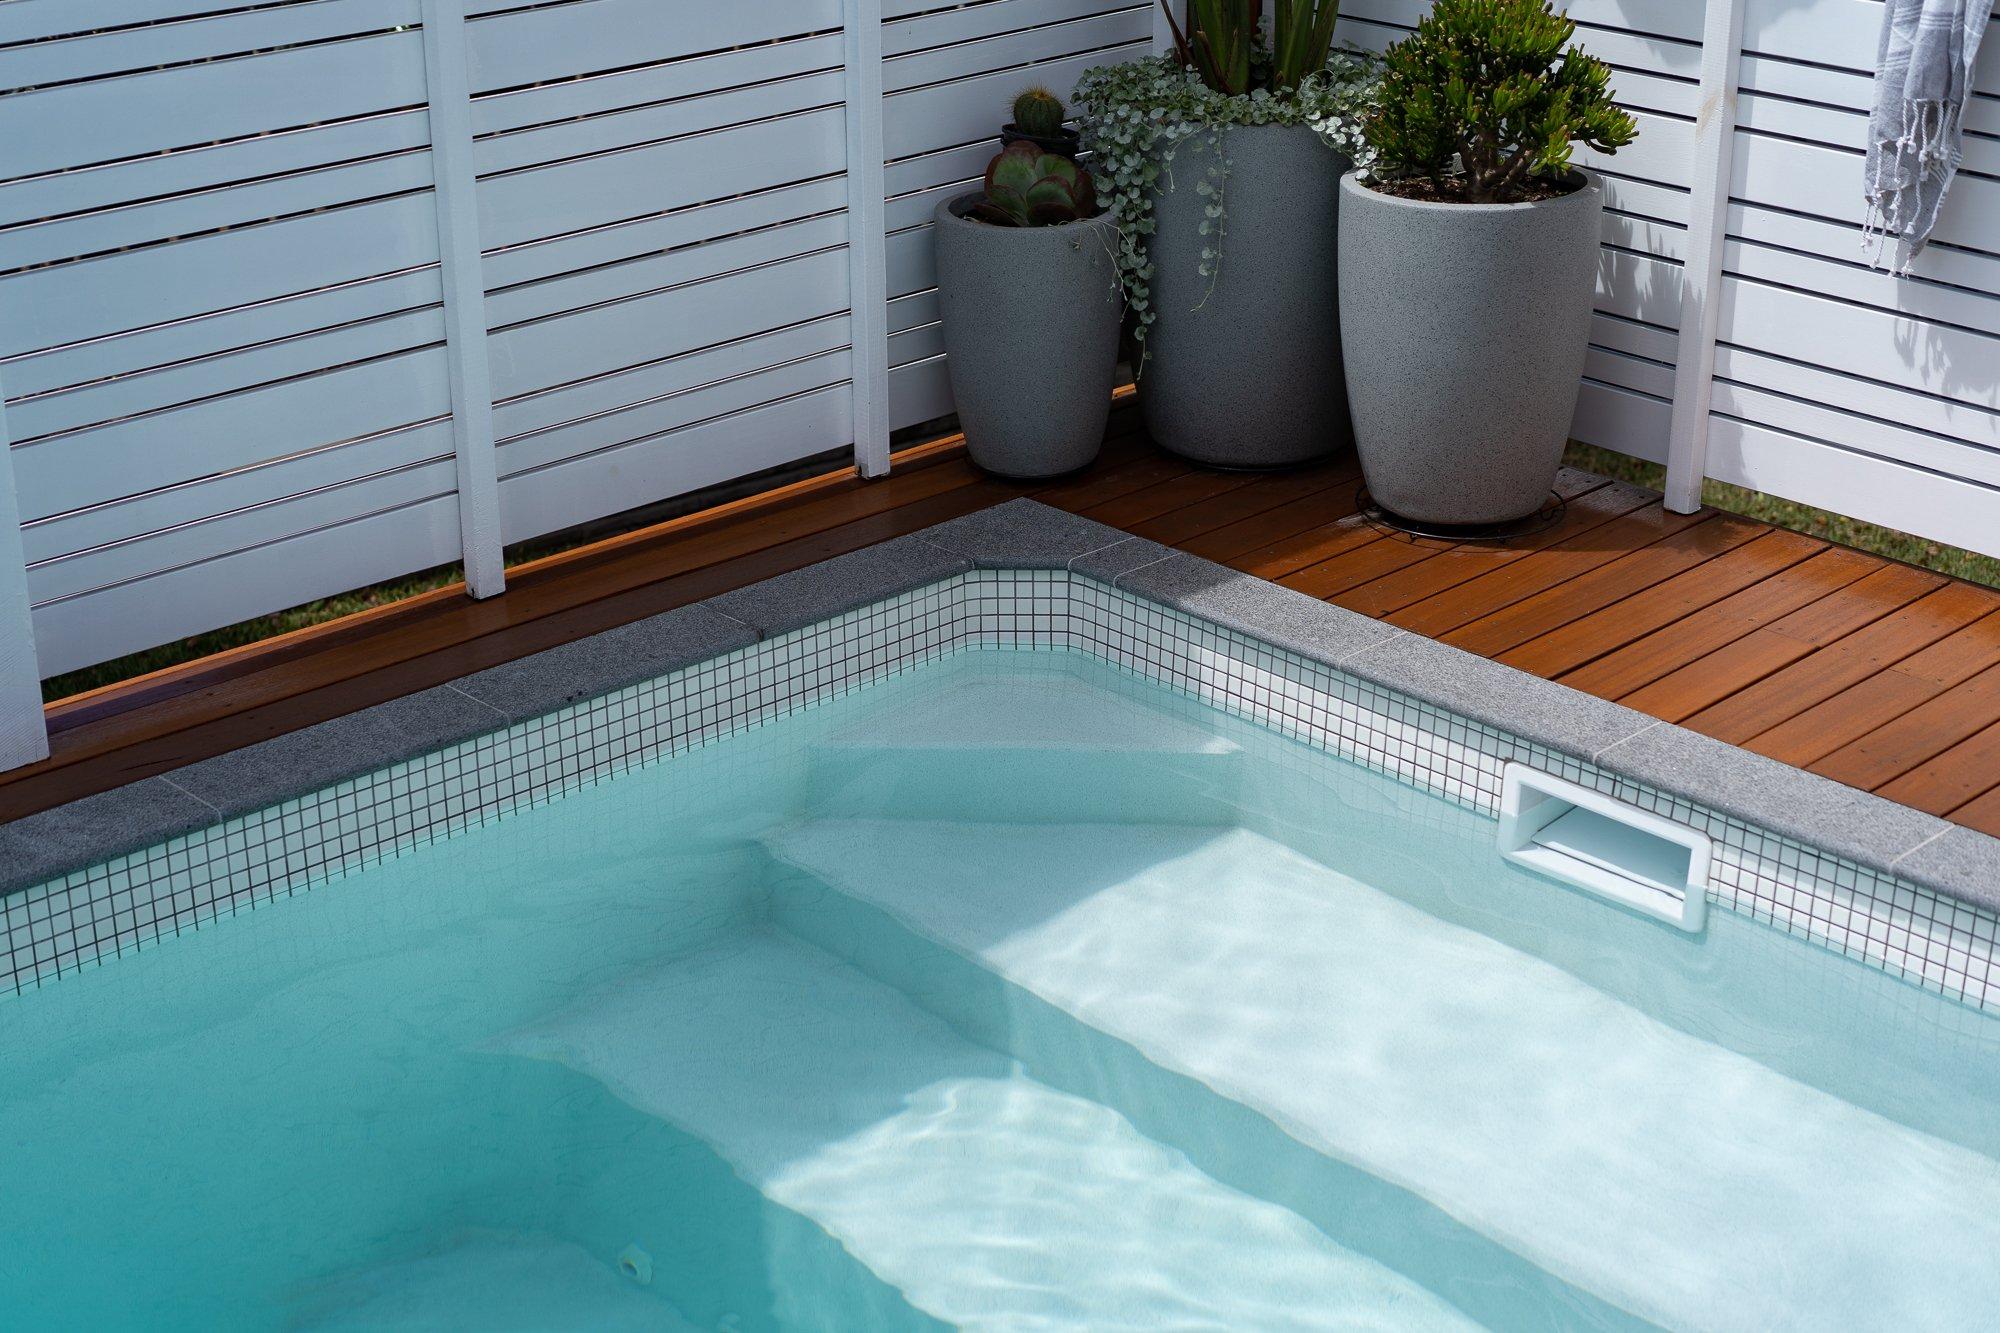 Plungie Studio 12ft x 7ft plunge pool in Mediterranean Blue